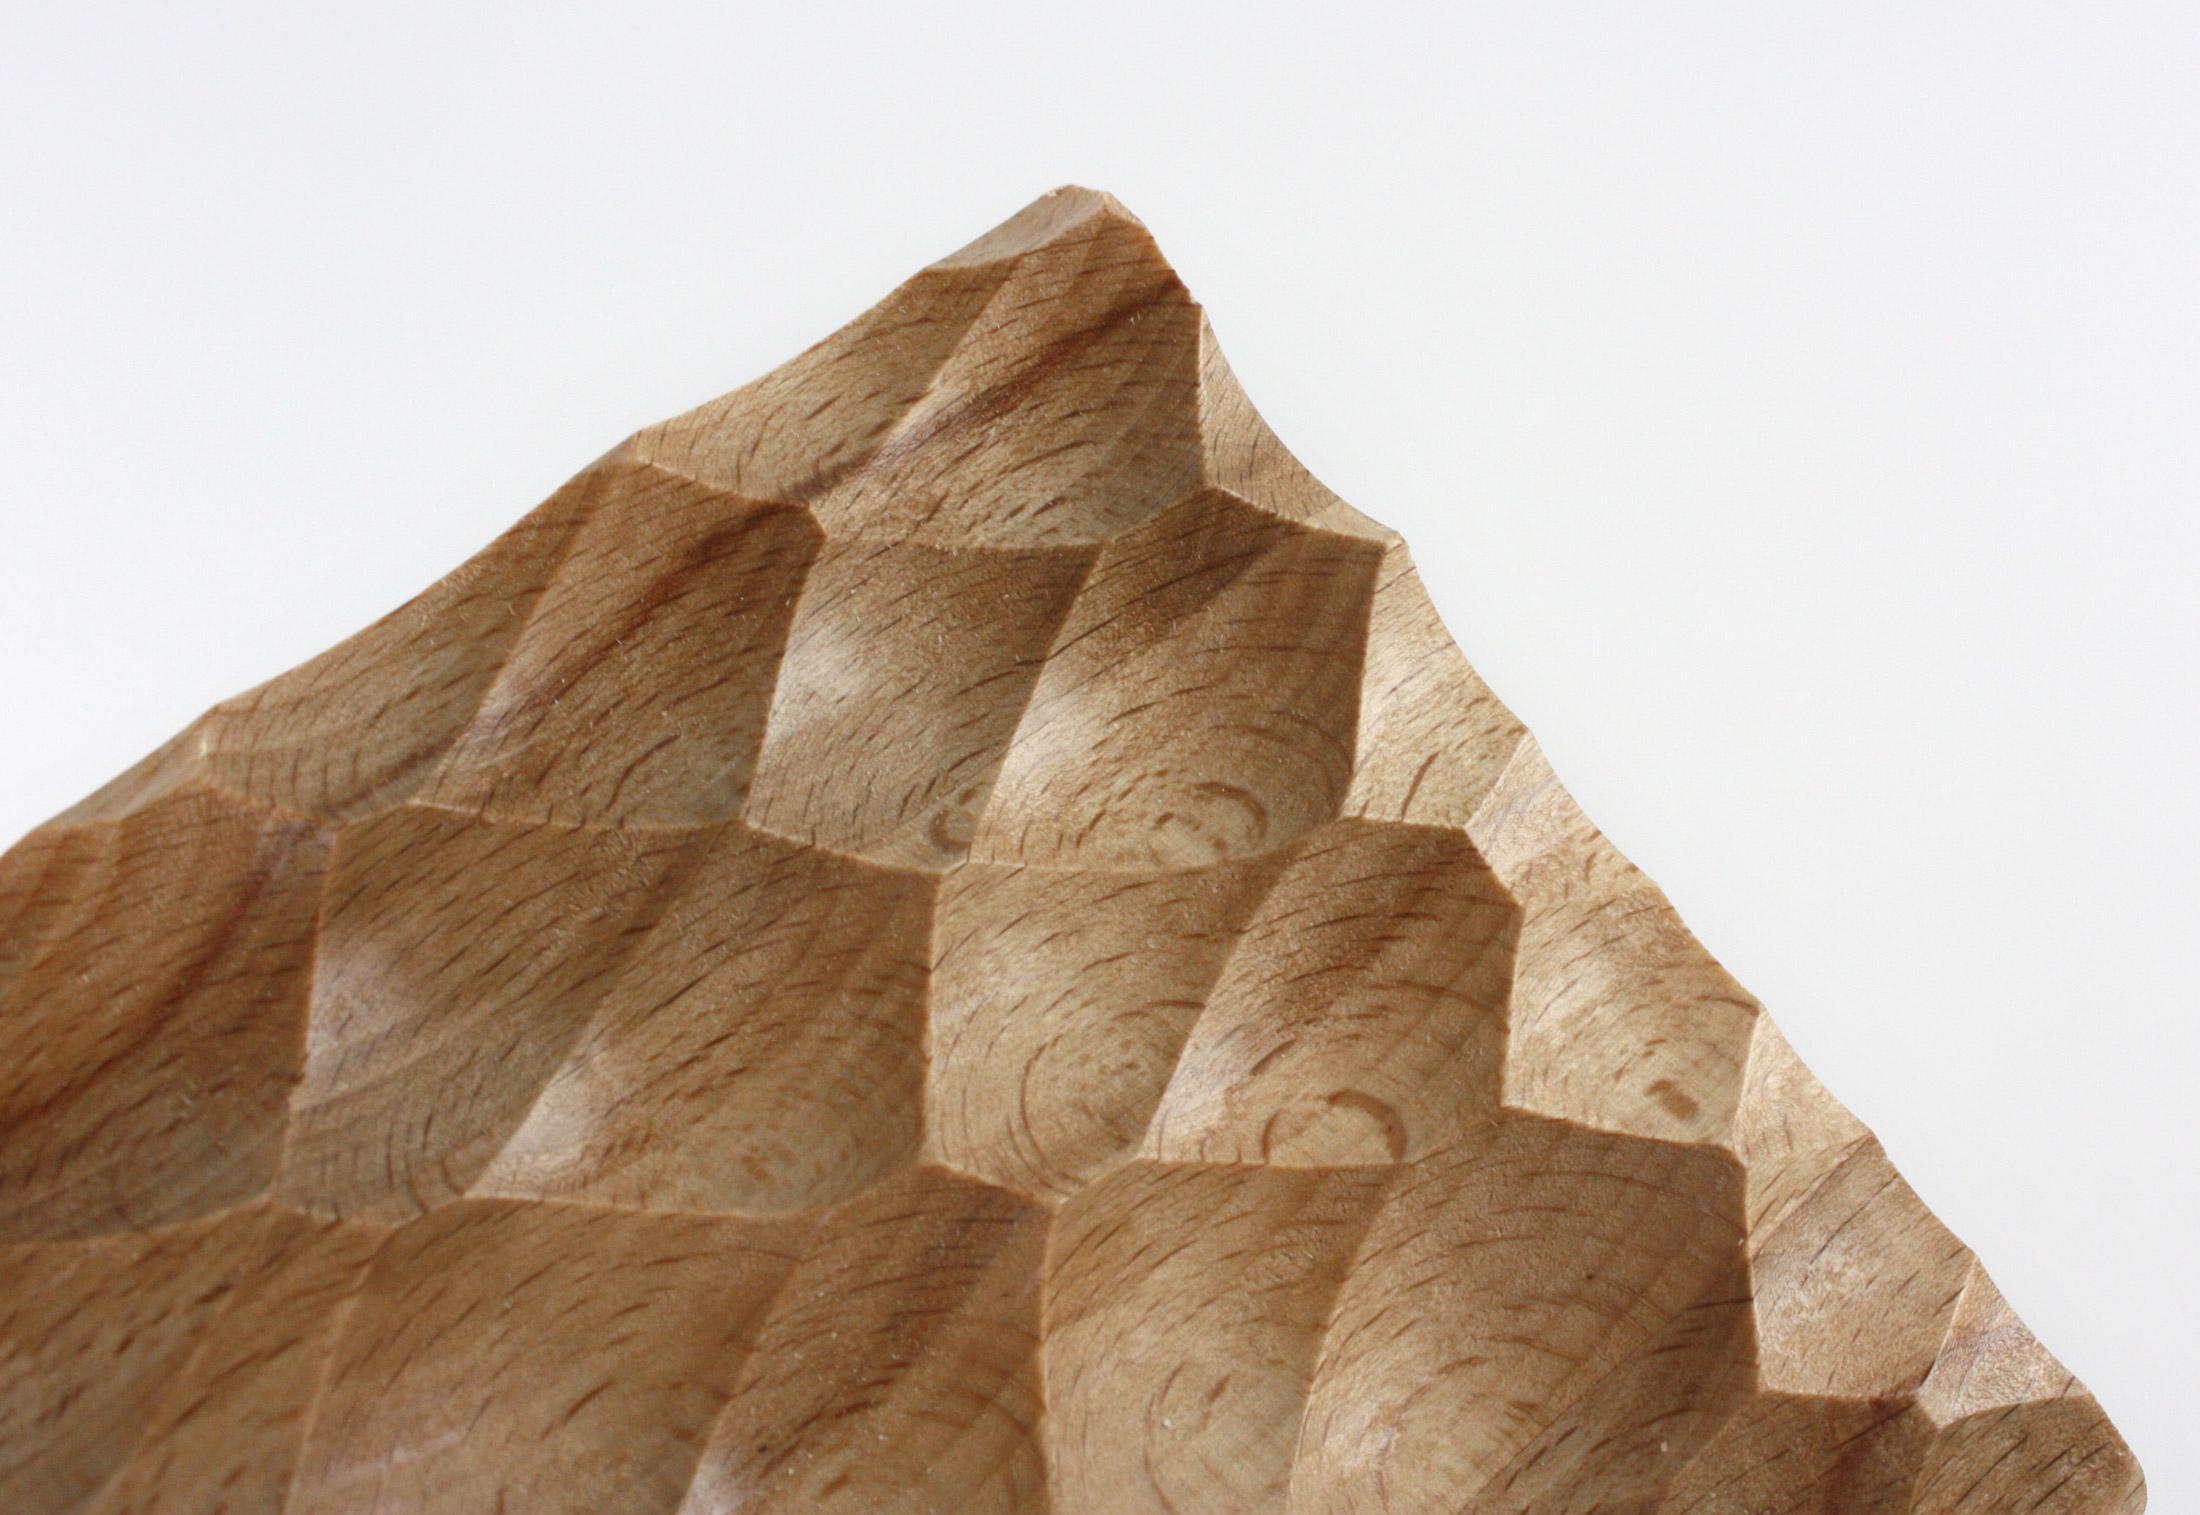 Wave Panel Beech Wood Adria By Georg Ackermann